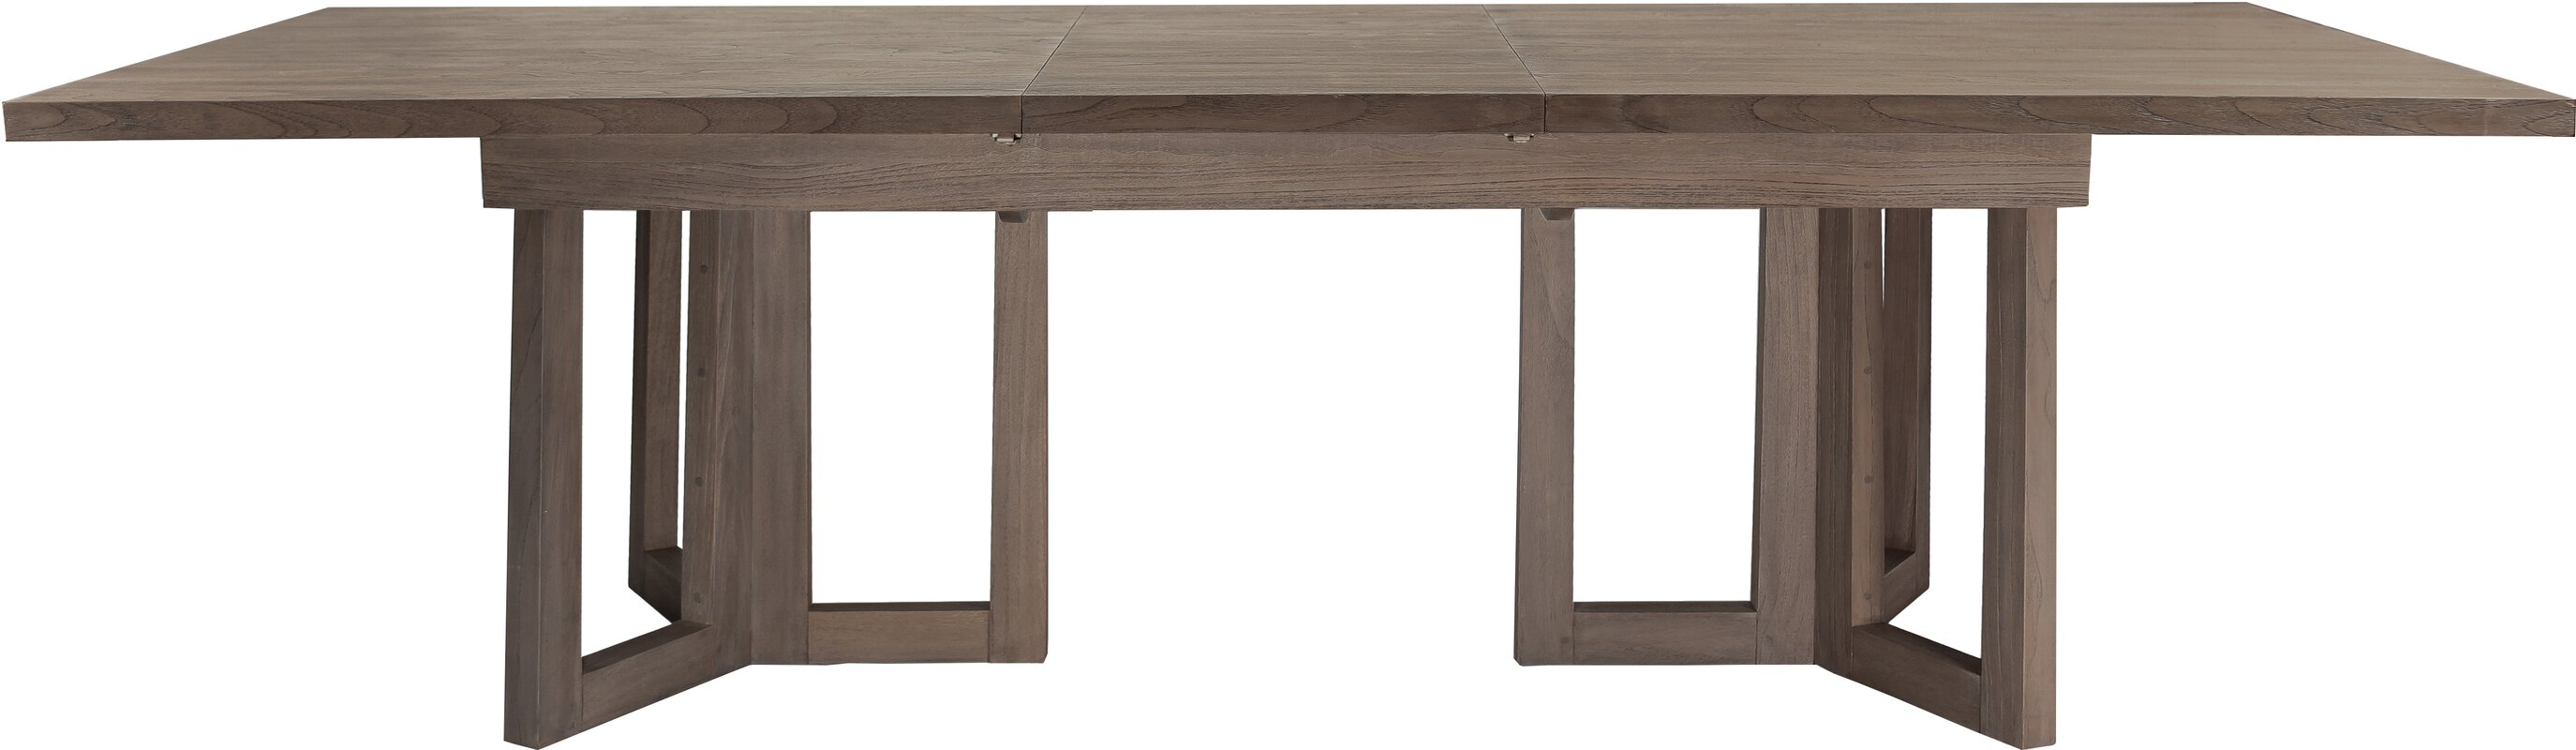 Brownstone Furniture Palmer Dining Table & Reviews | Wayfair